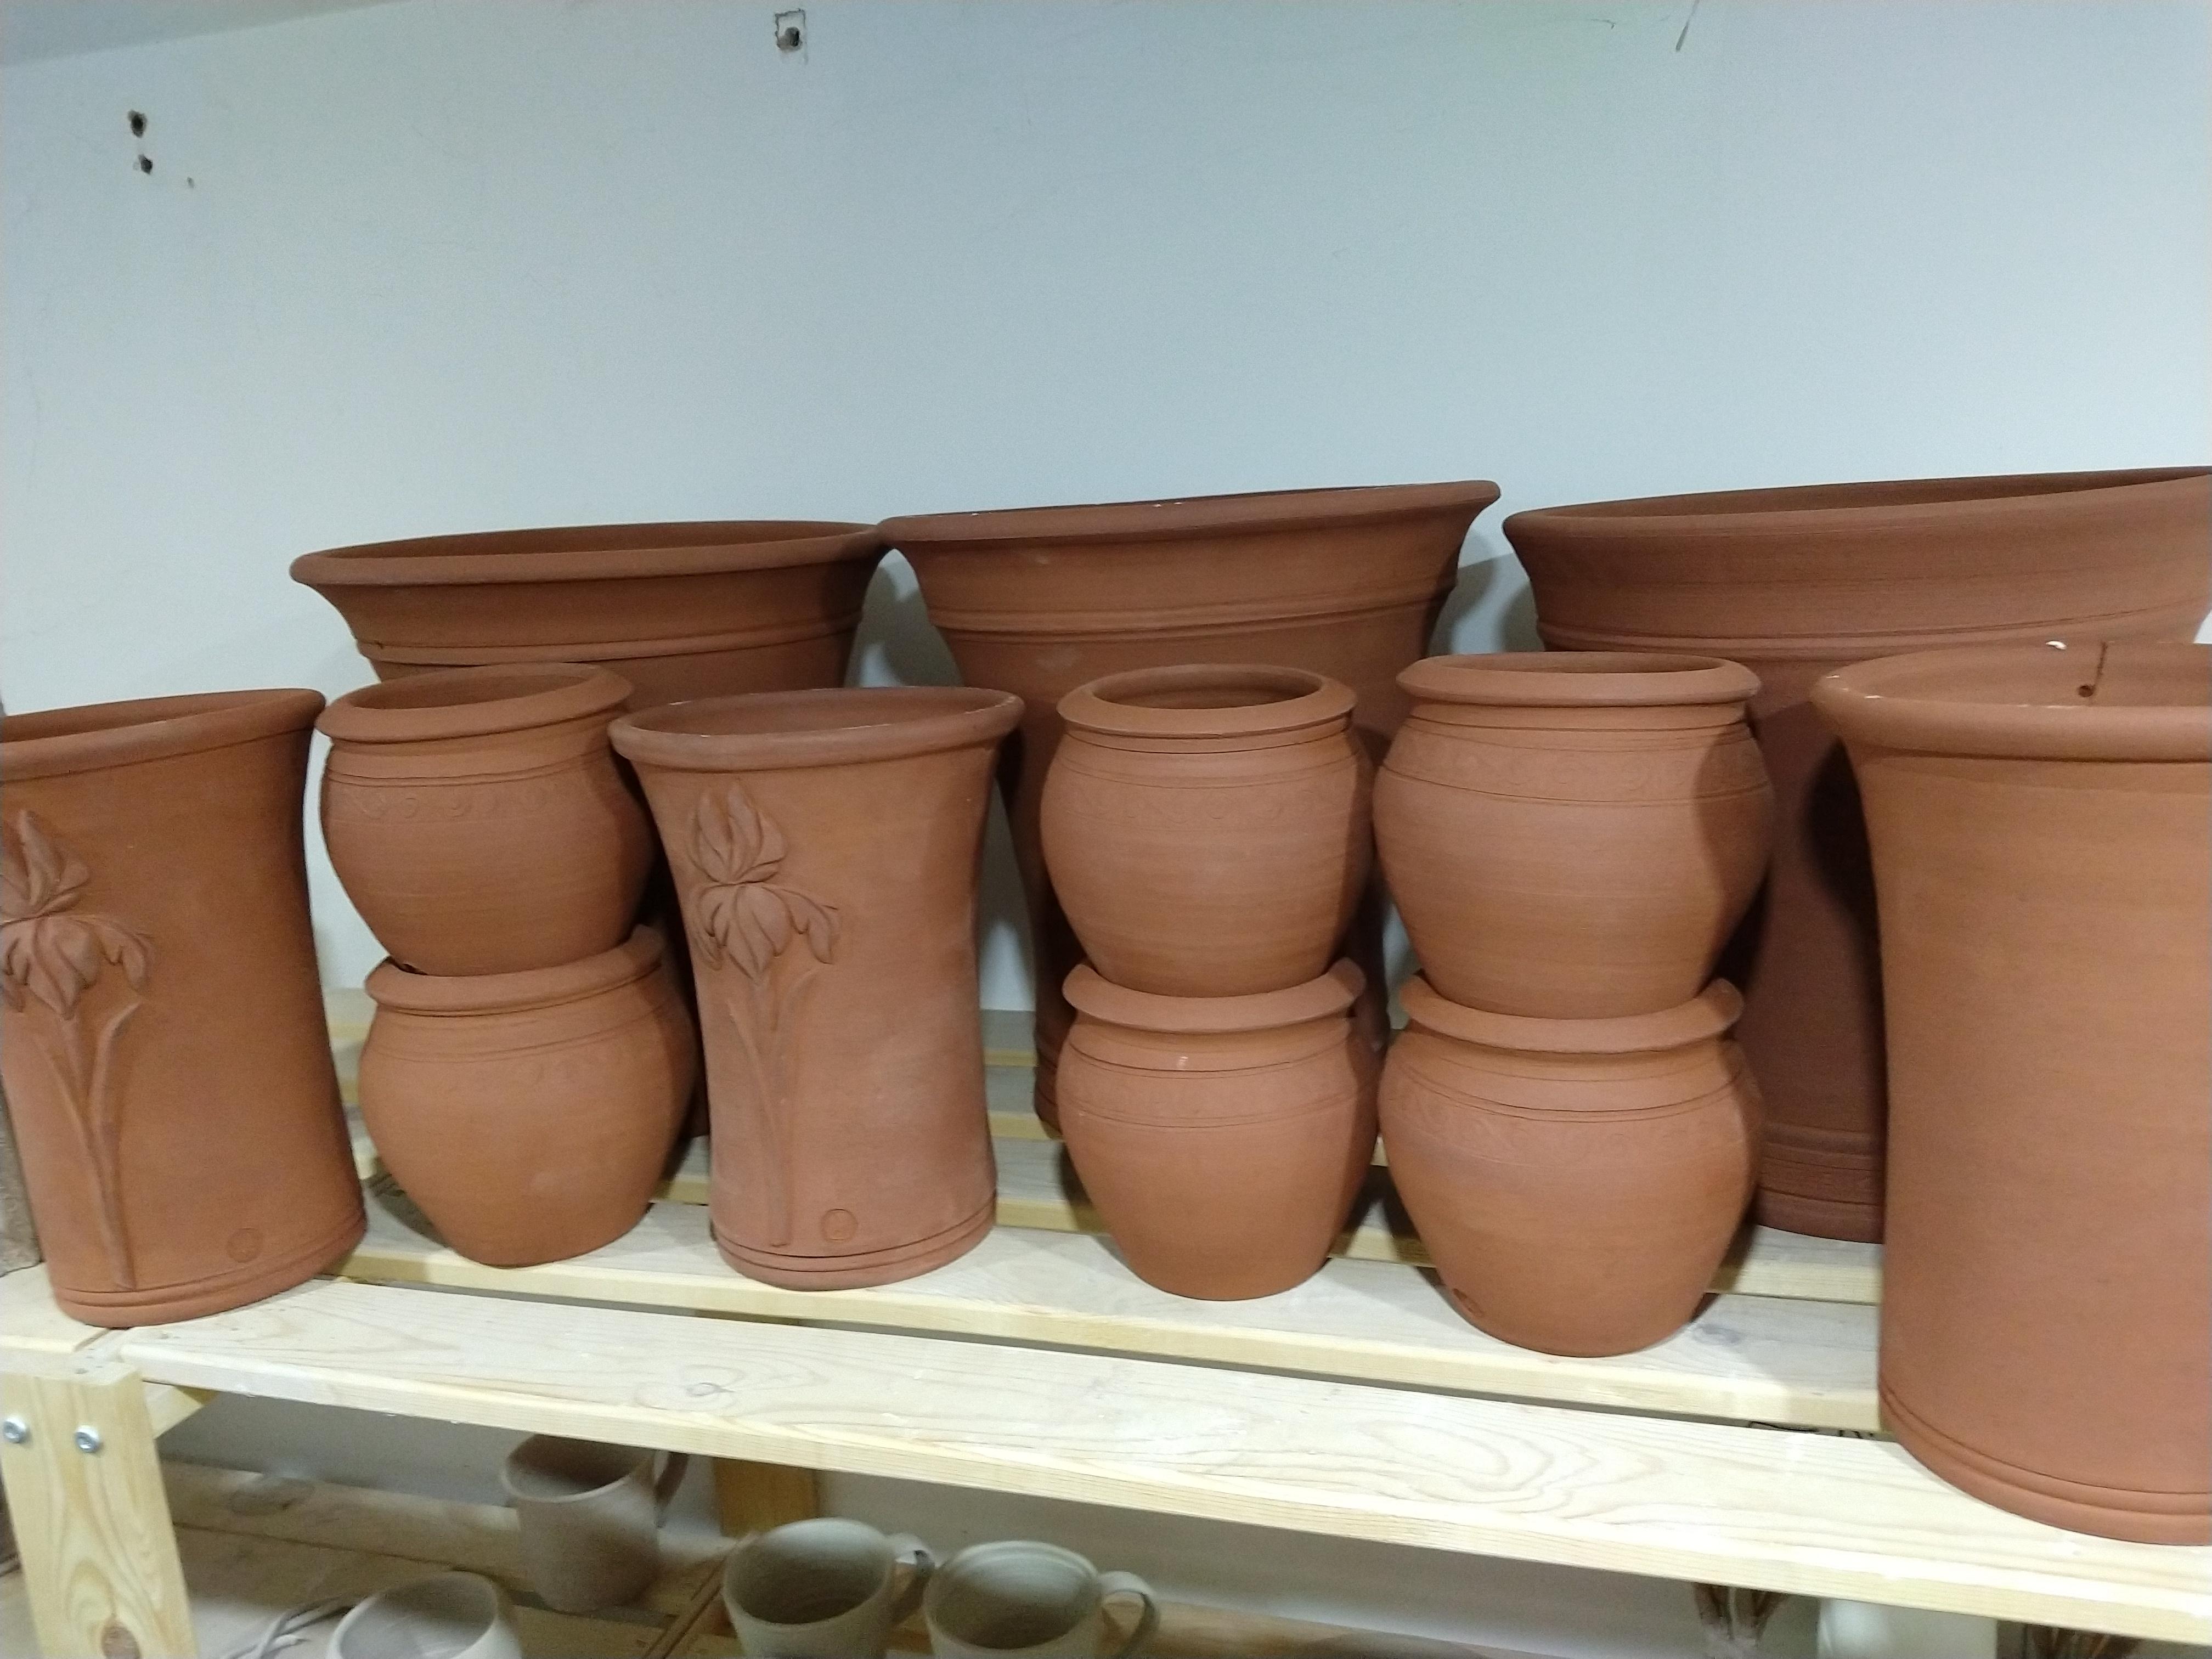 Steve Kingsford Garden Pots